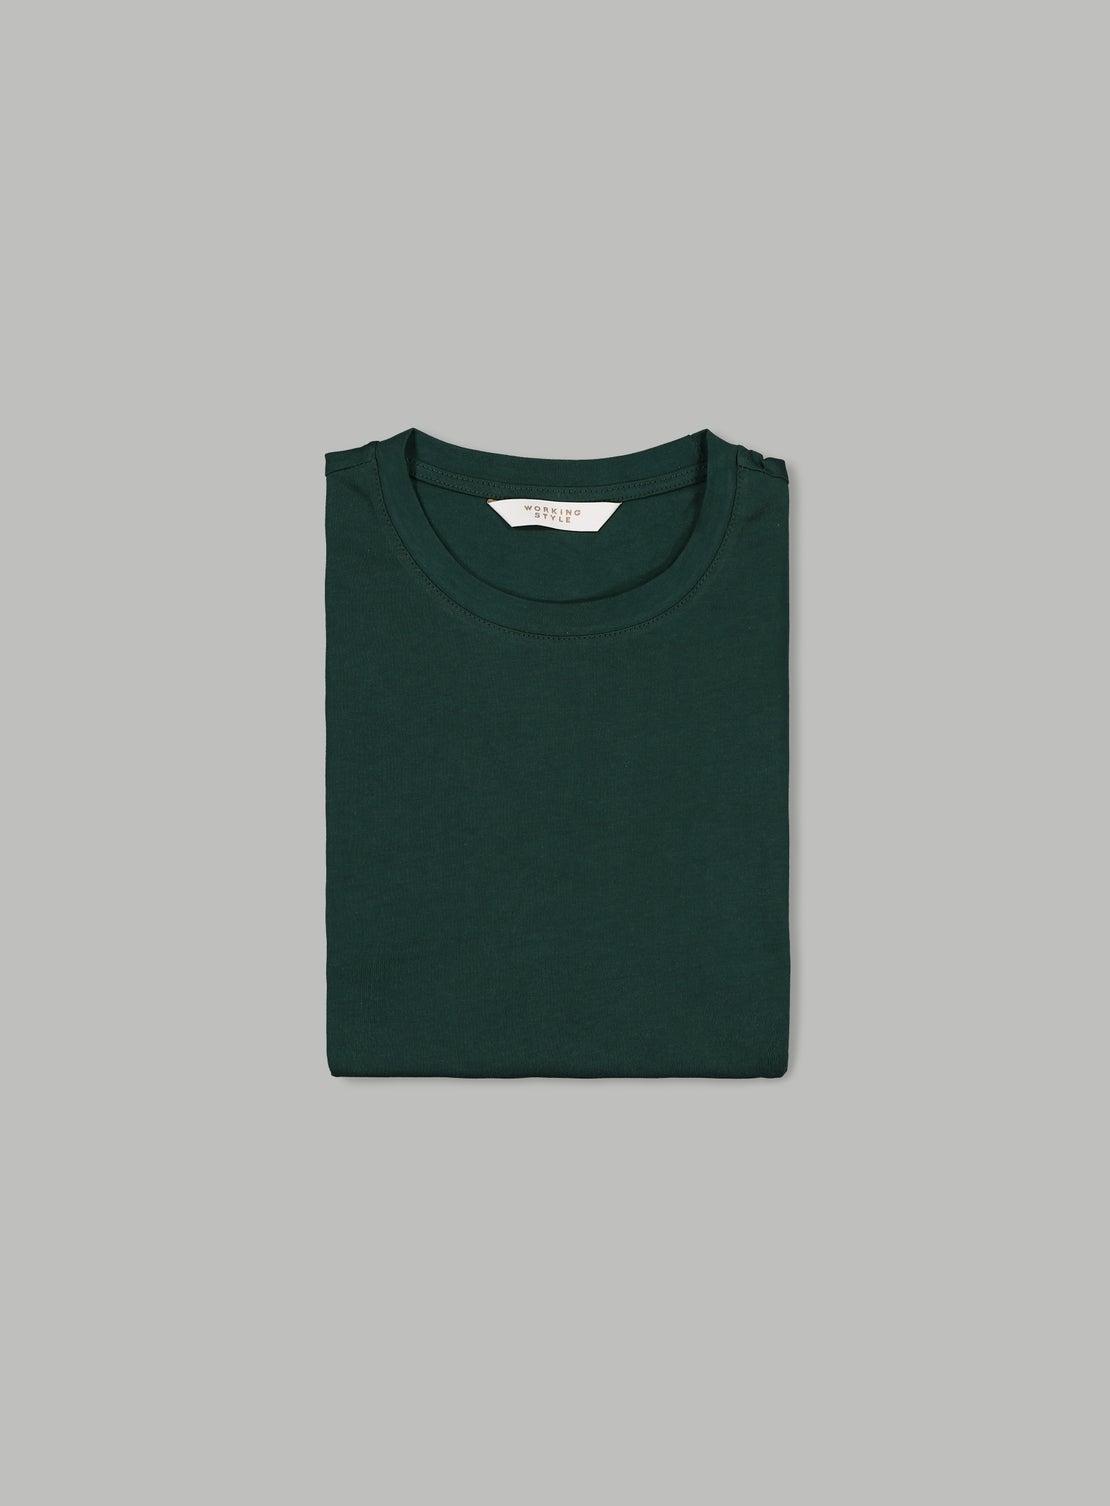 Benny Green T-Shirt